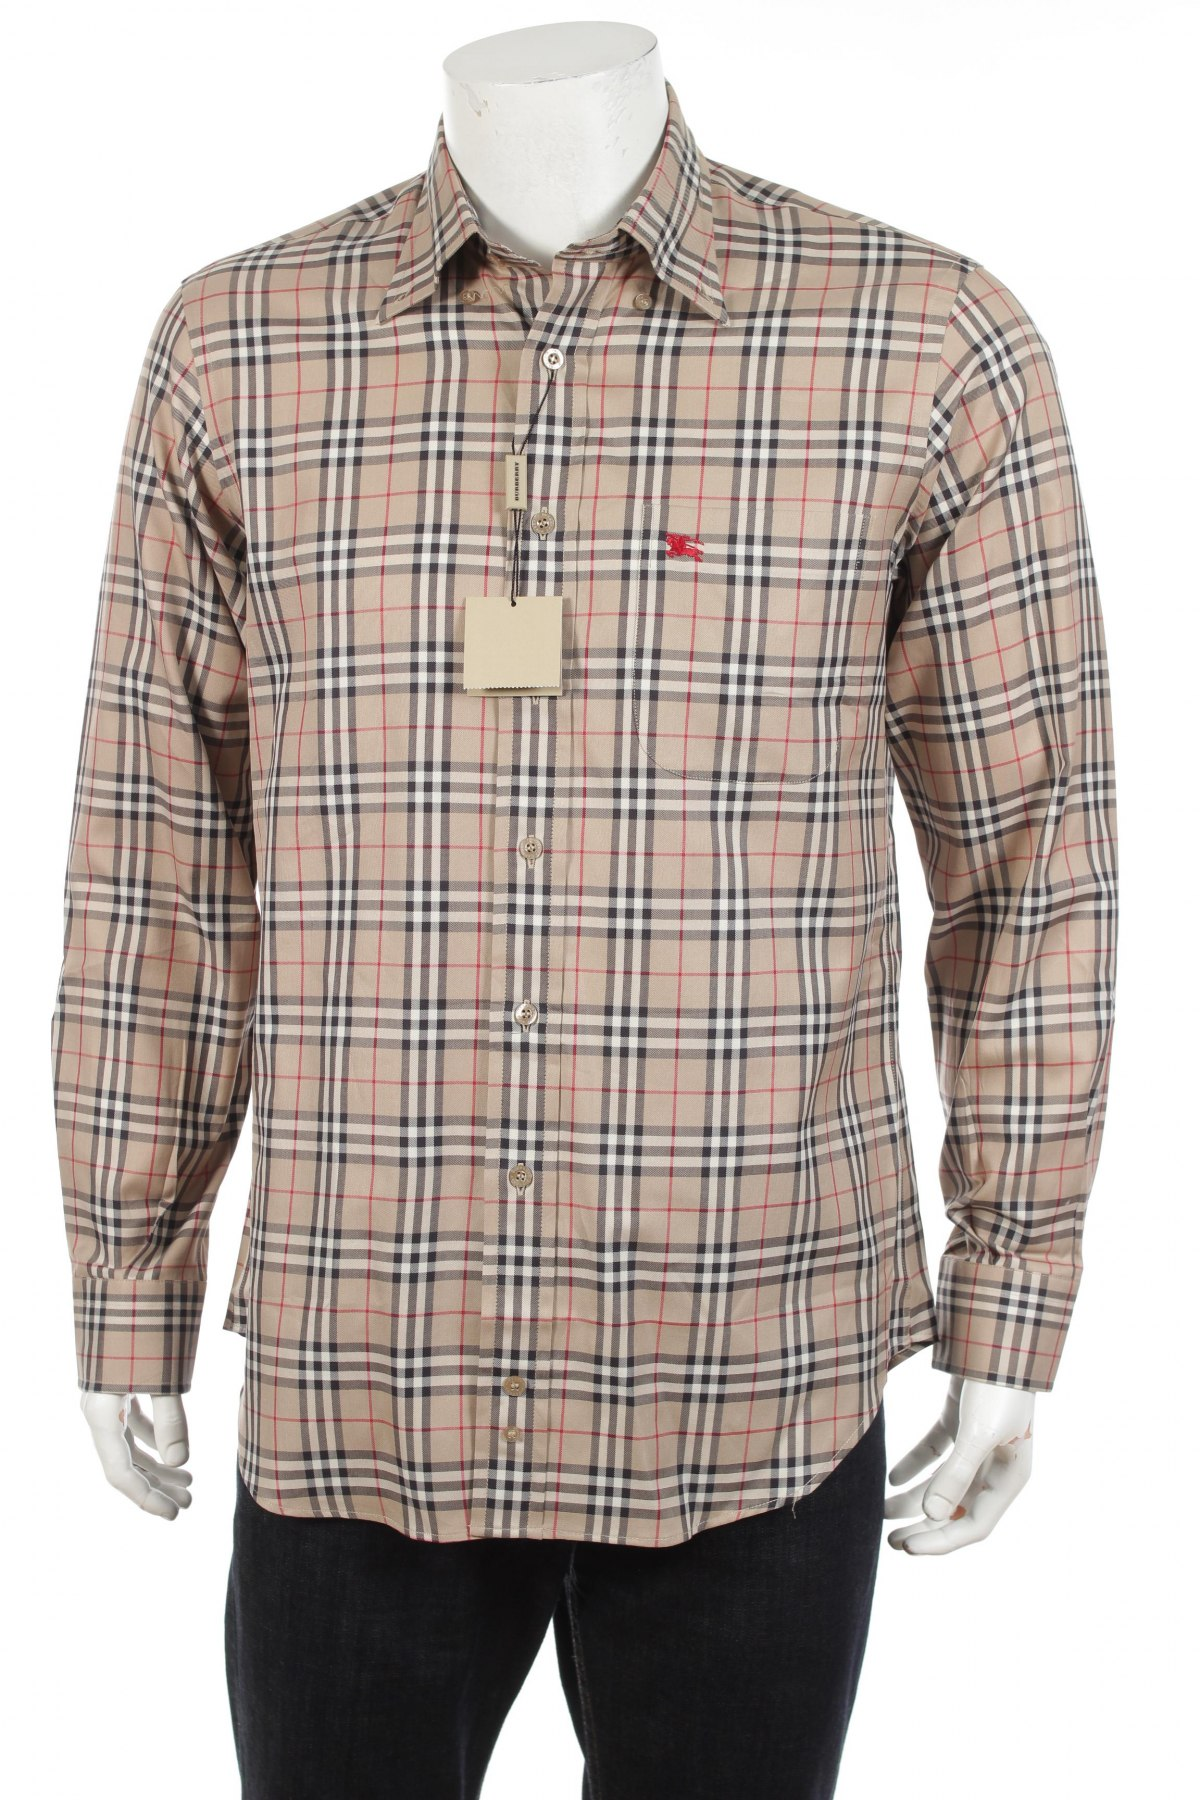 a3bc3ce994 Ανδρικό πουκάμισο Burberry - σε συμφέρουσα τιμή στο Remix -  8802246